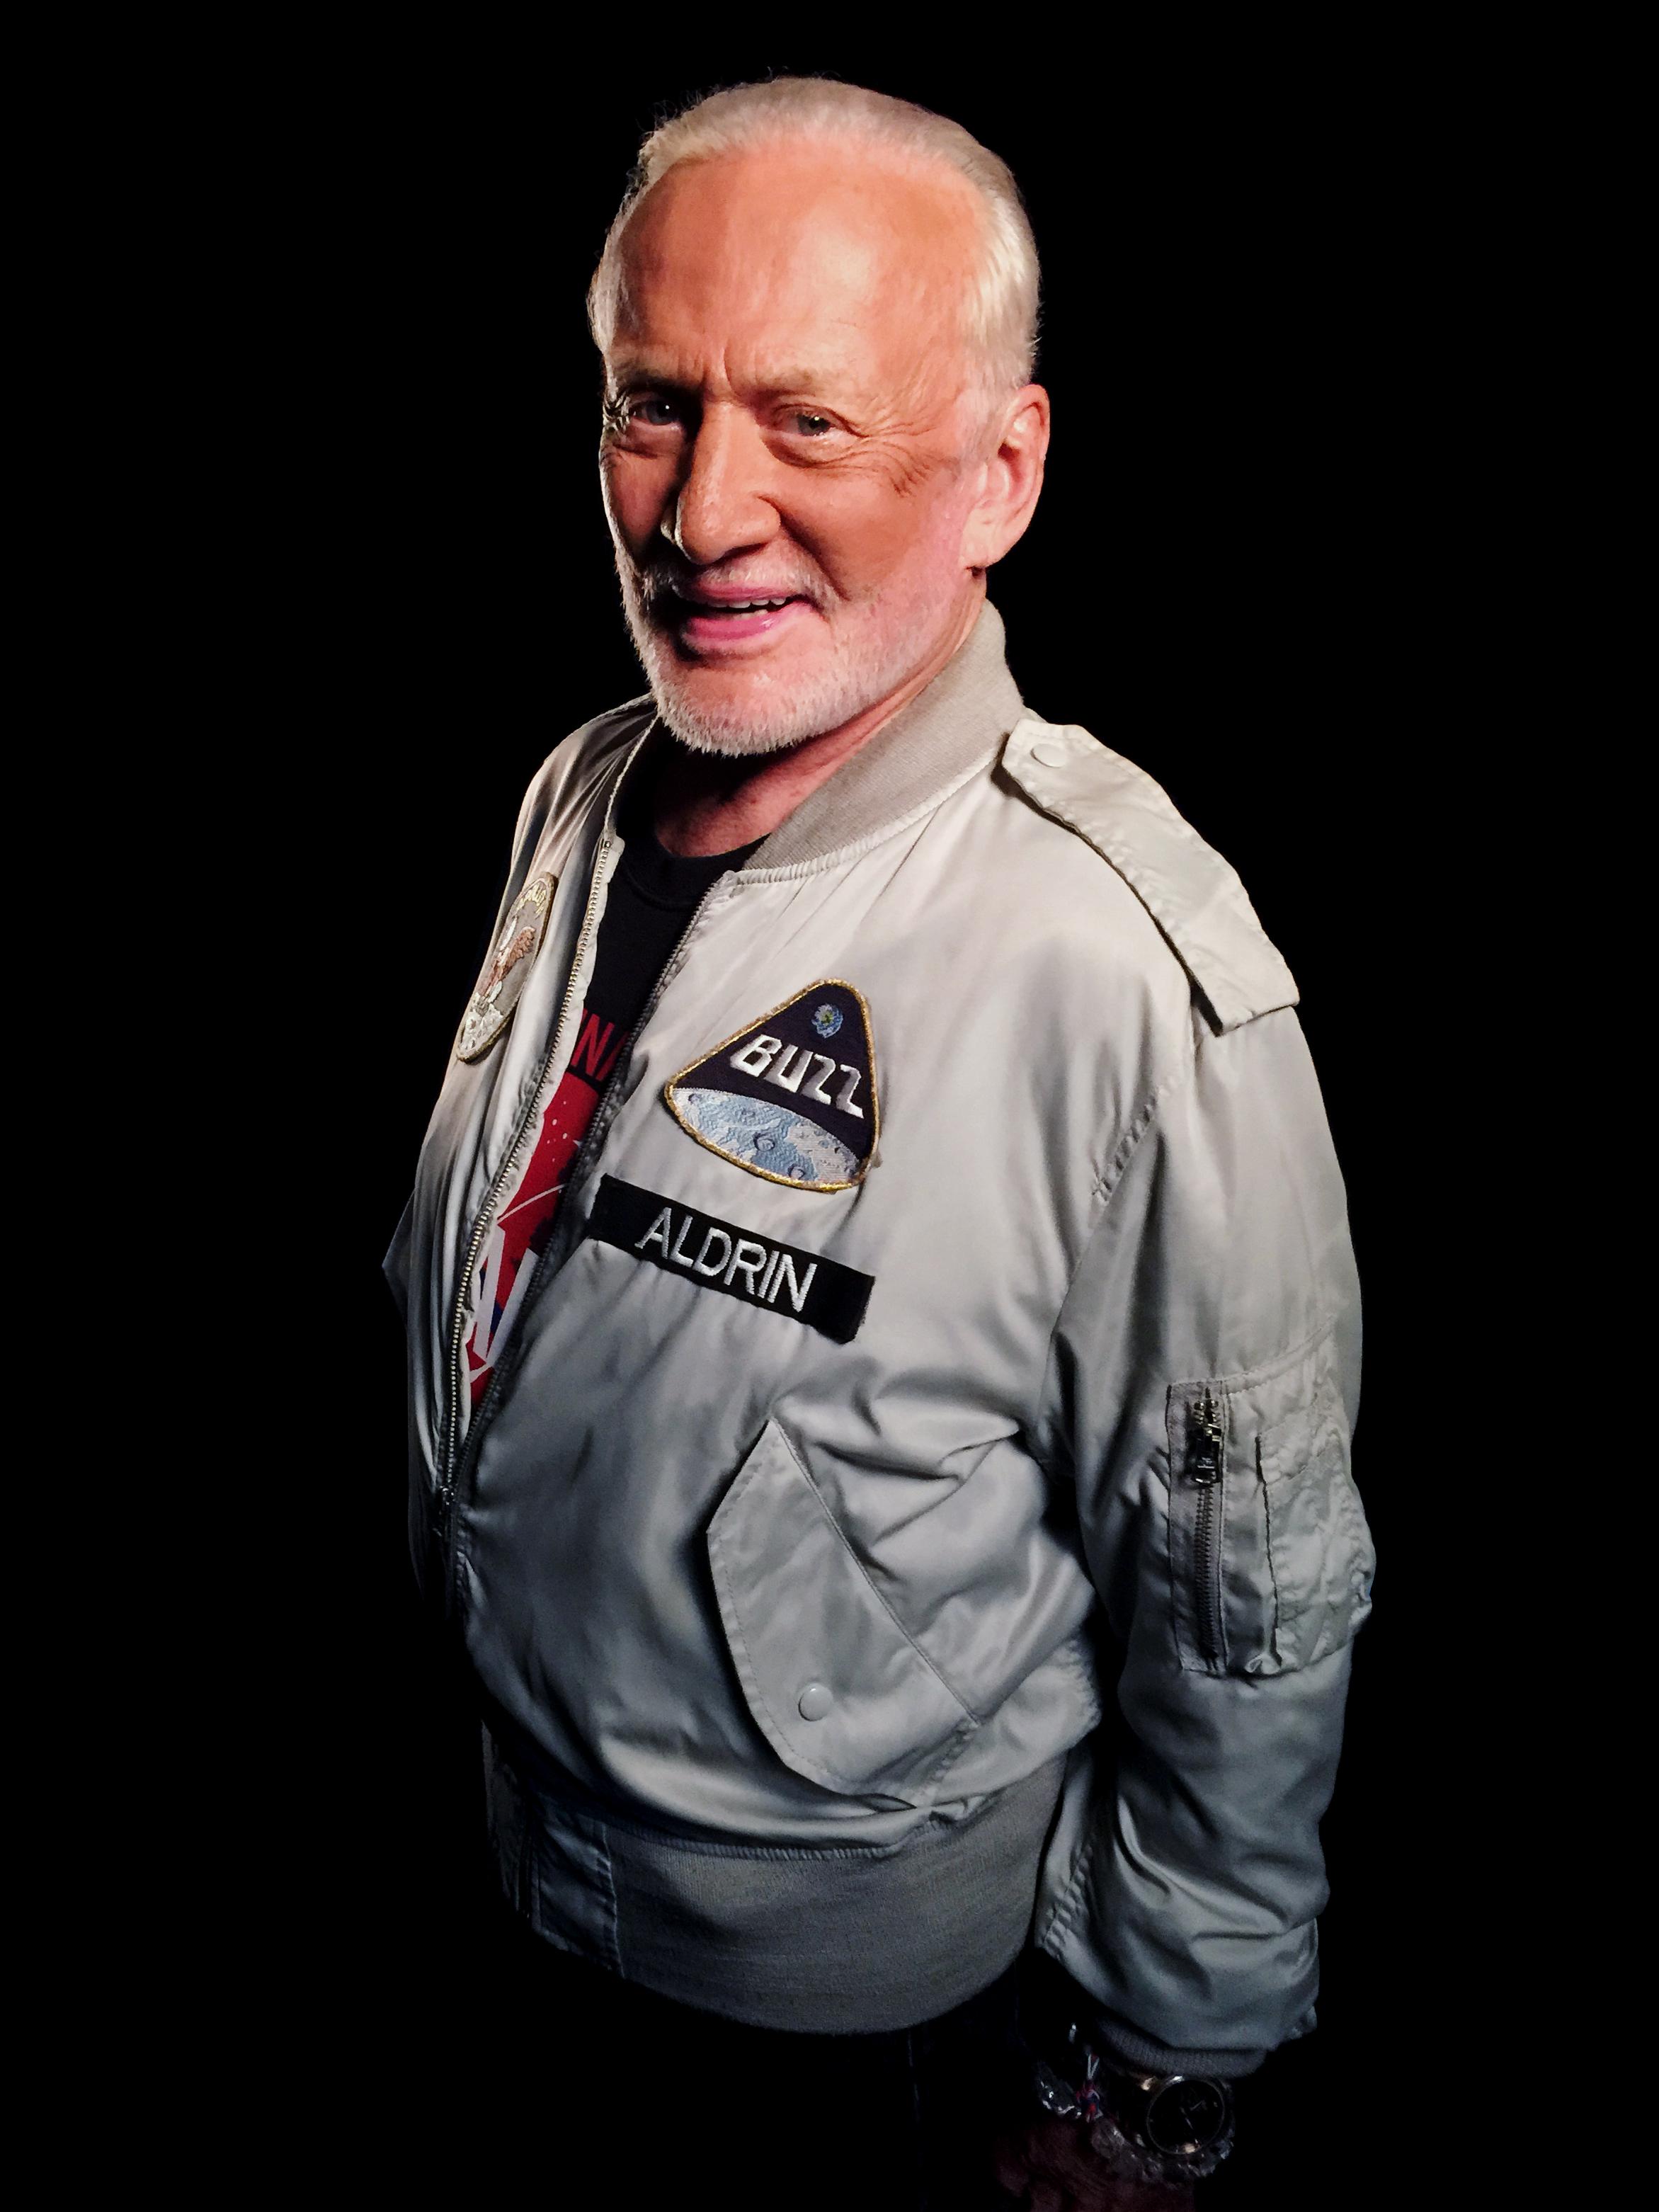 Buzz Aldrin Astronaut Apollo 11, Gemini 12   All Eyes at